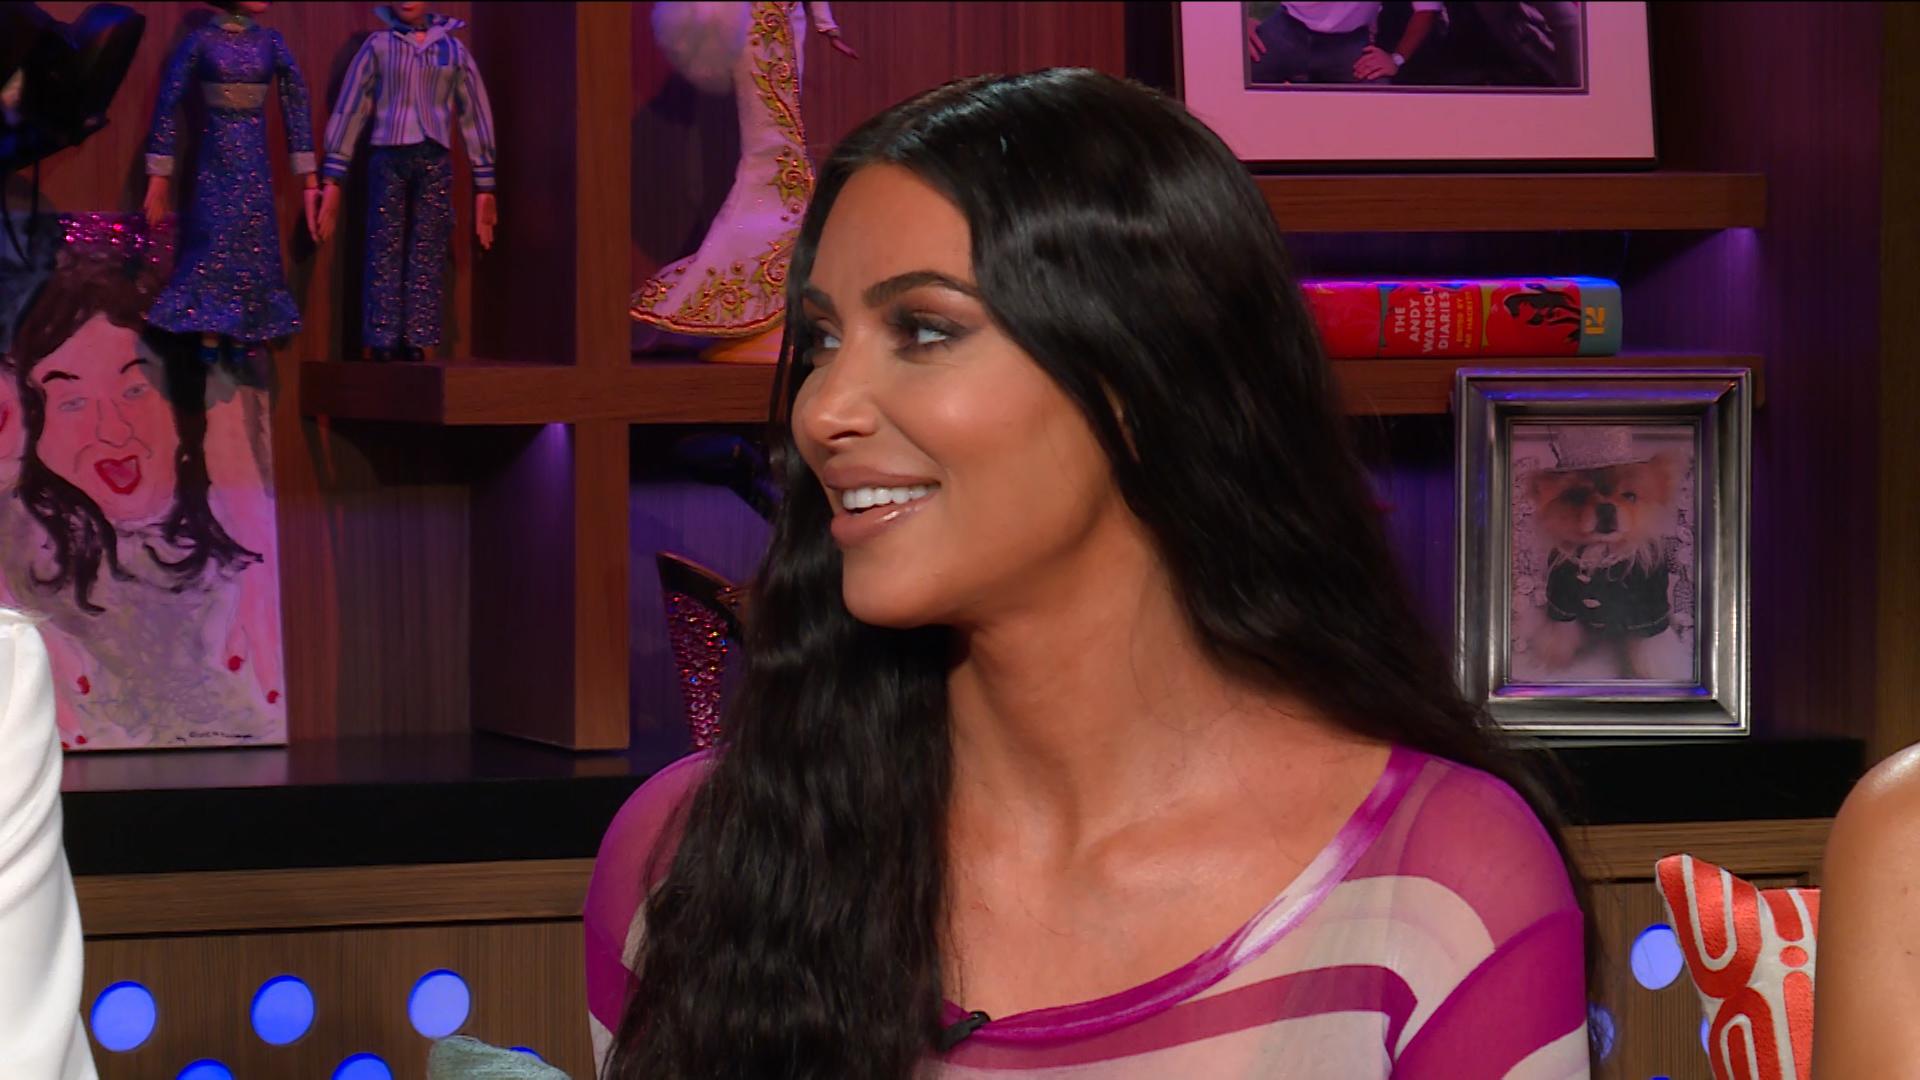 Jam (Turn It Up) (Kim Kardashian Tribute) MP3 Song ...